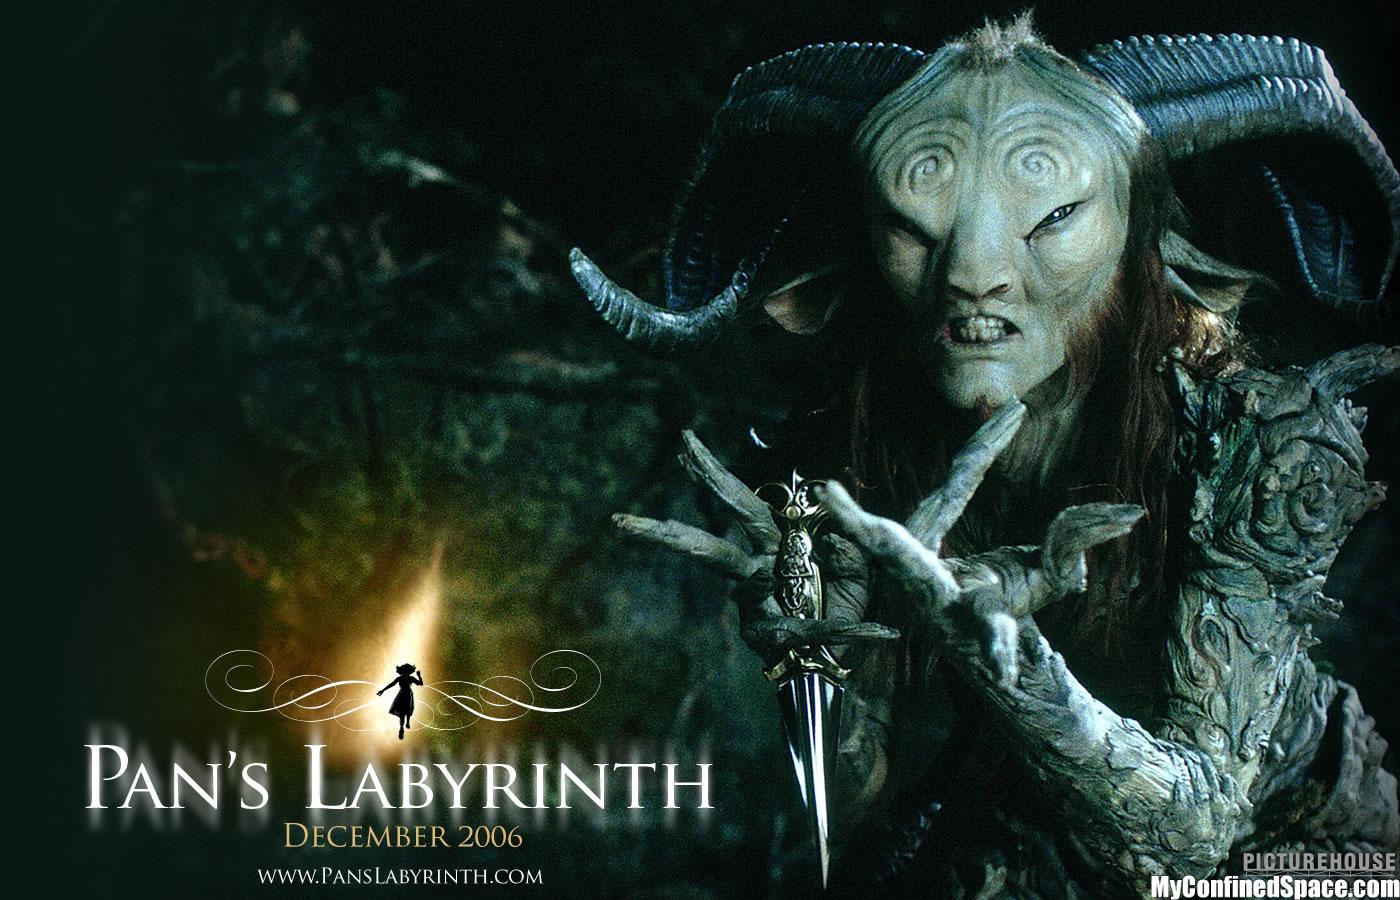 http://2.bp.blogspot.com/-b3BWITRfOmY/ULBdkMm_fhI/AAAAAAAAJZg/OVMIe347-K4/s1600/pans-labyrinth-movie-poster-wallpaper.jpg